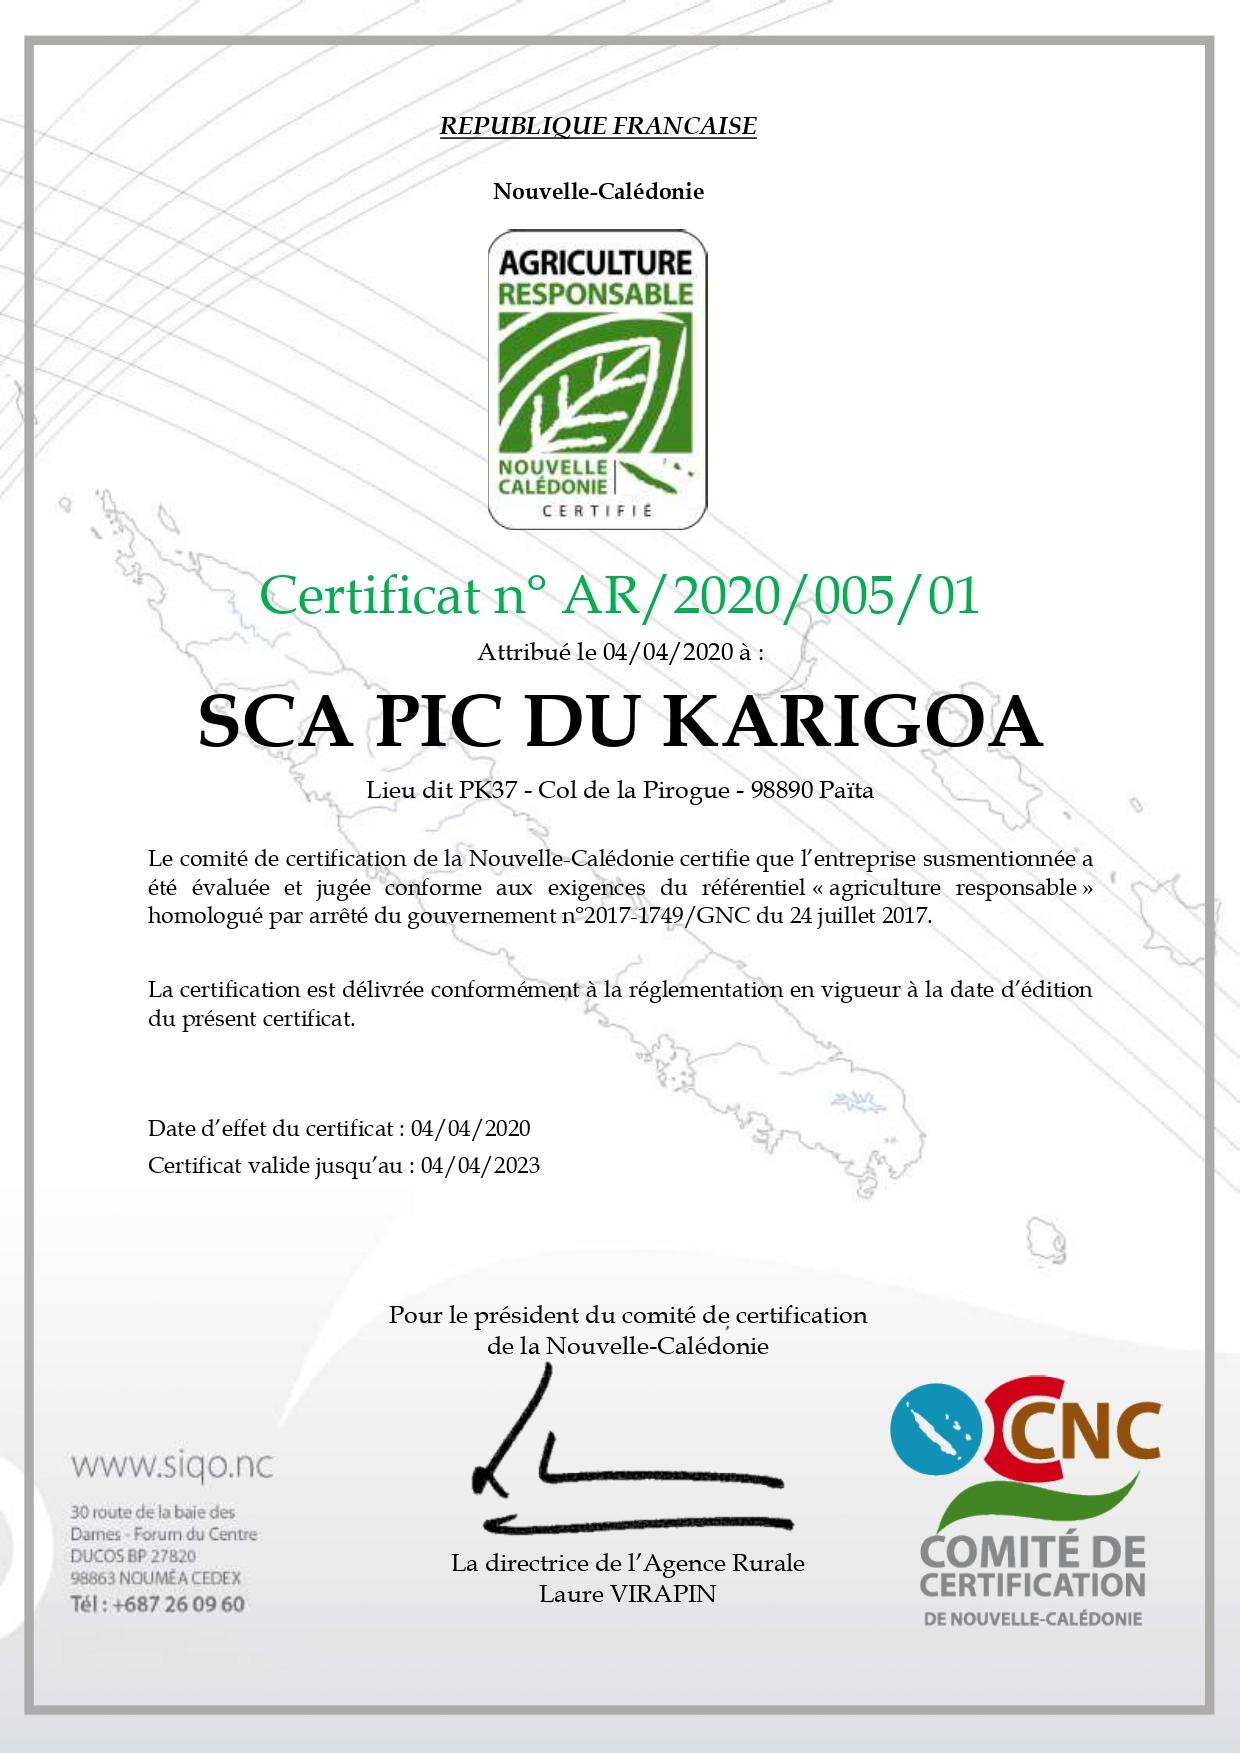 Agriculture+Responsable+AR+association+certification+nouvelle caledonie+innovante+sca+pic+karigoa